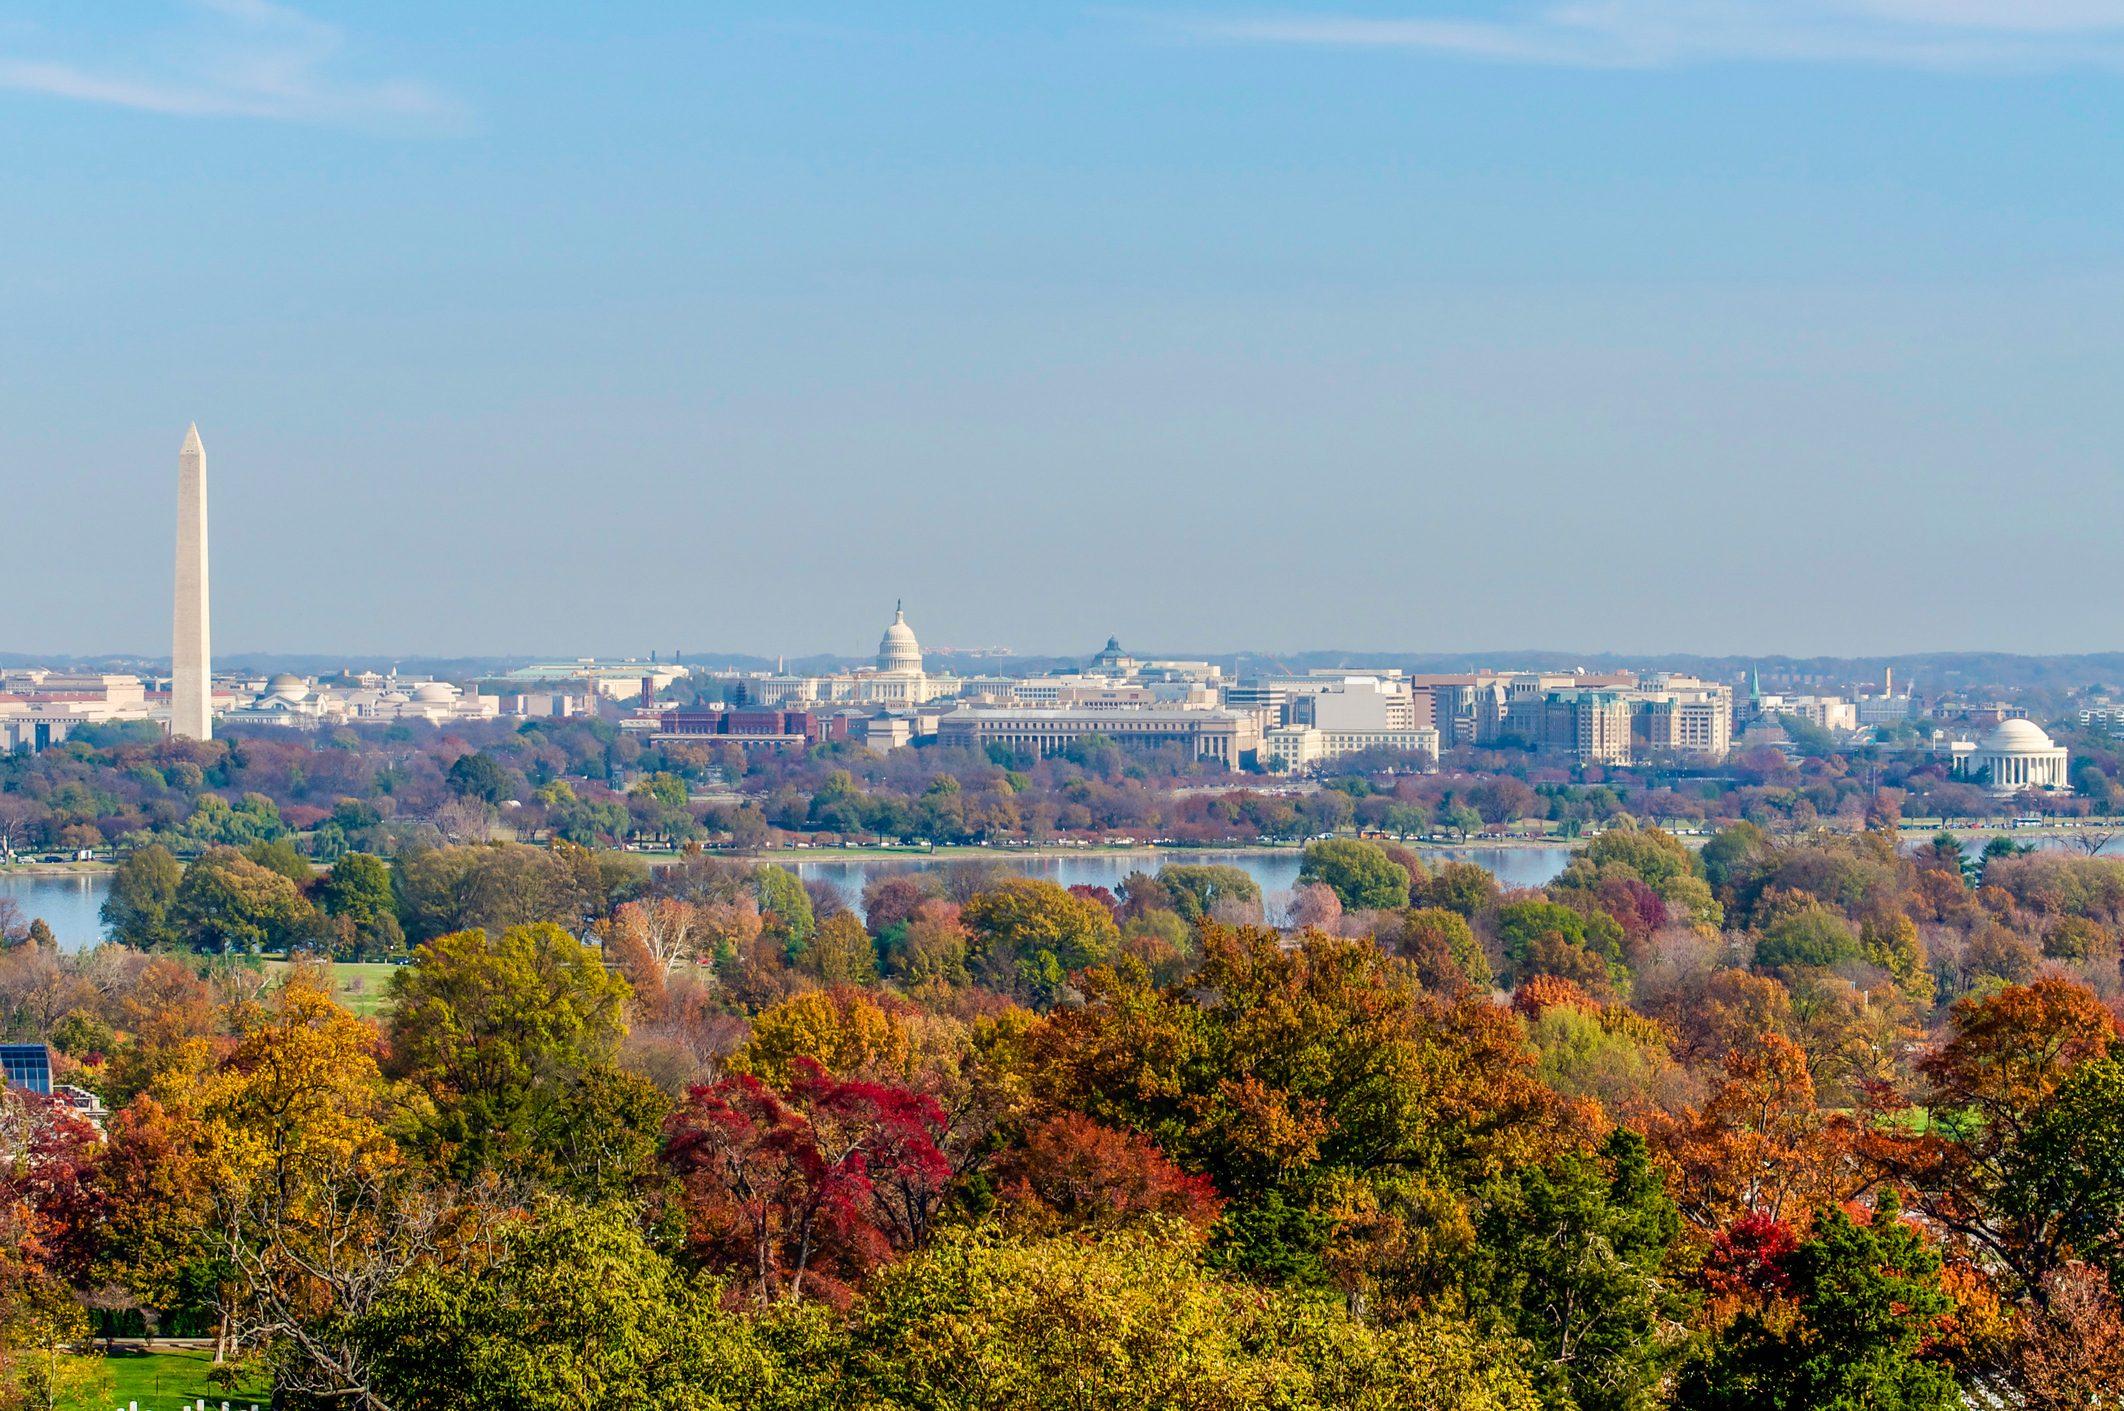 Fall in Washington D.C.